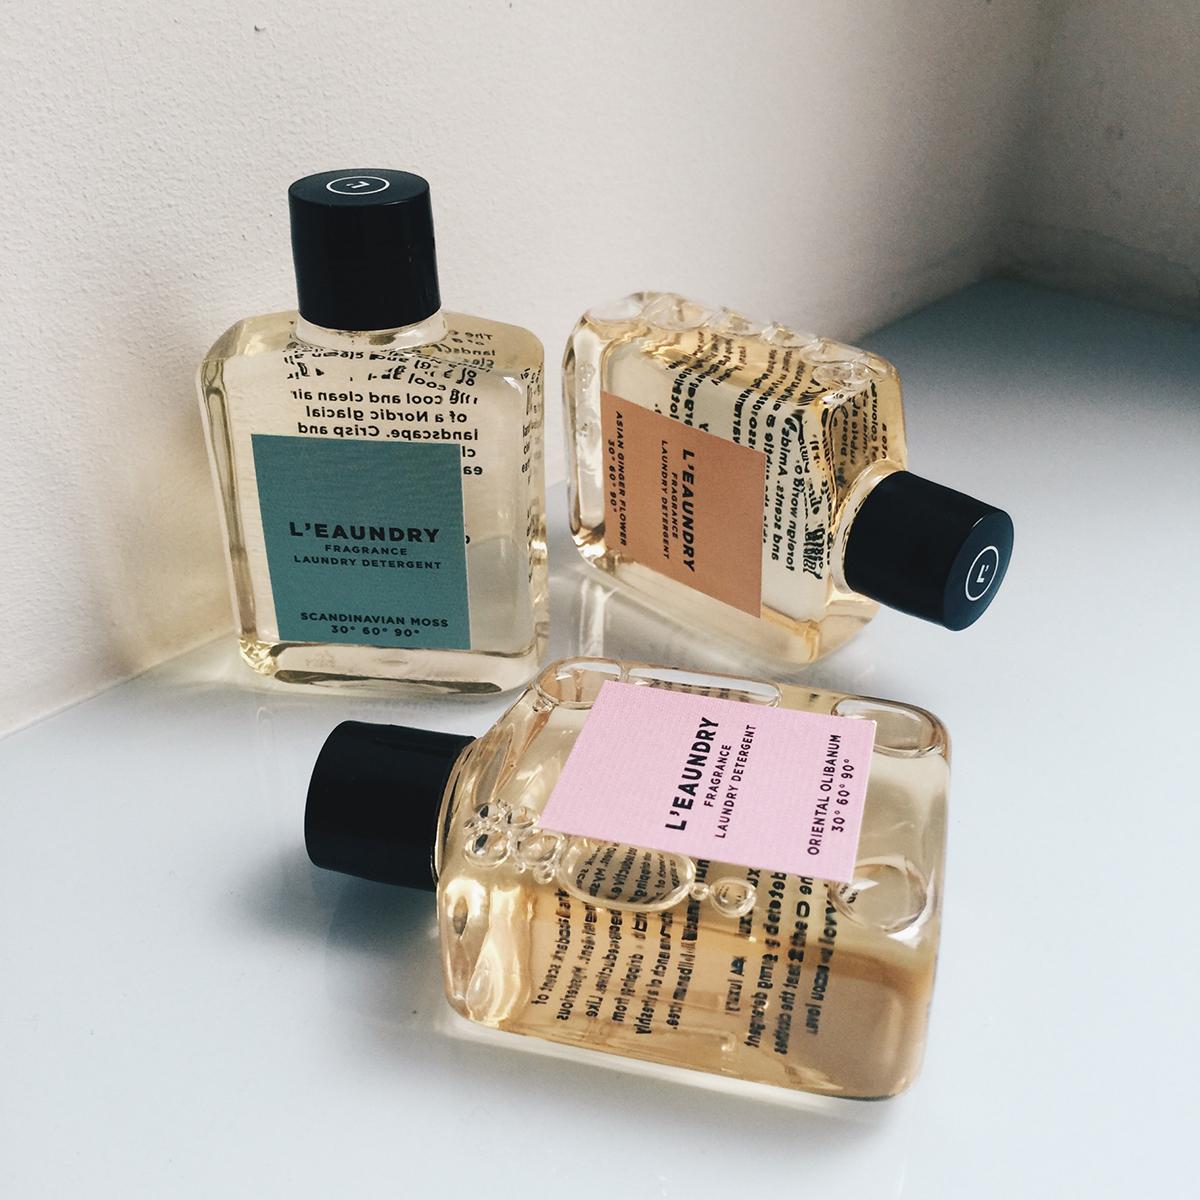 Laundry Fragrance Detergent Miniatures